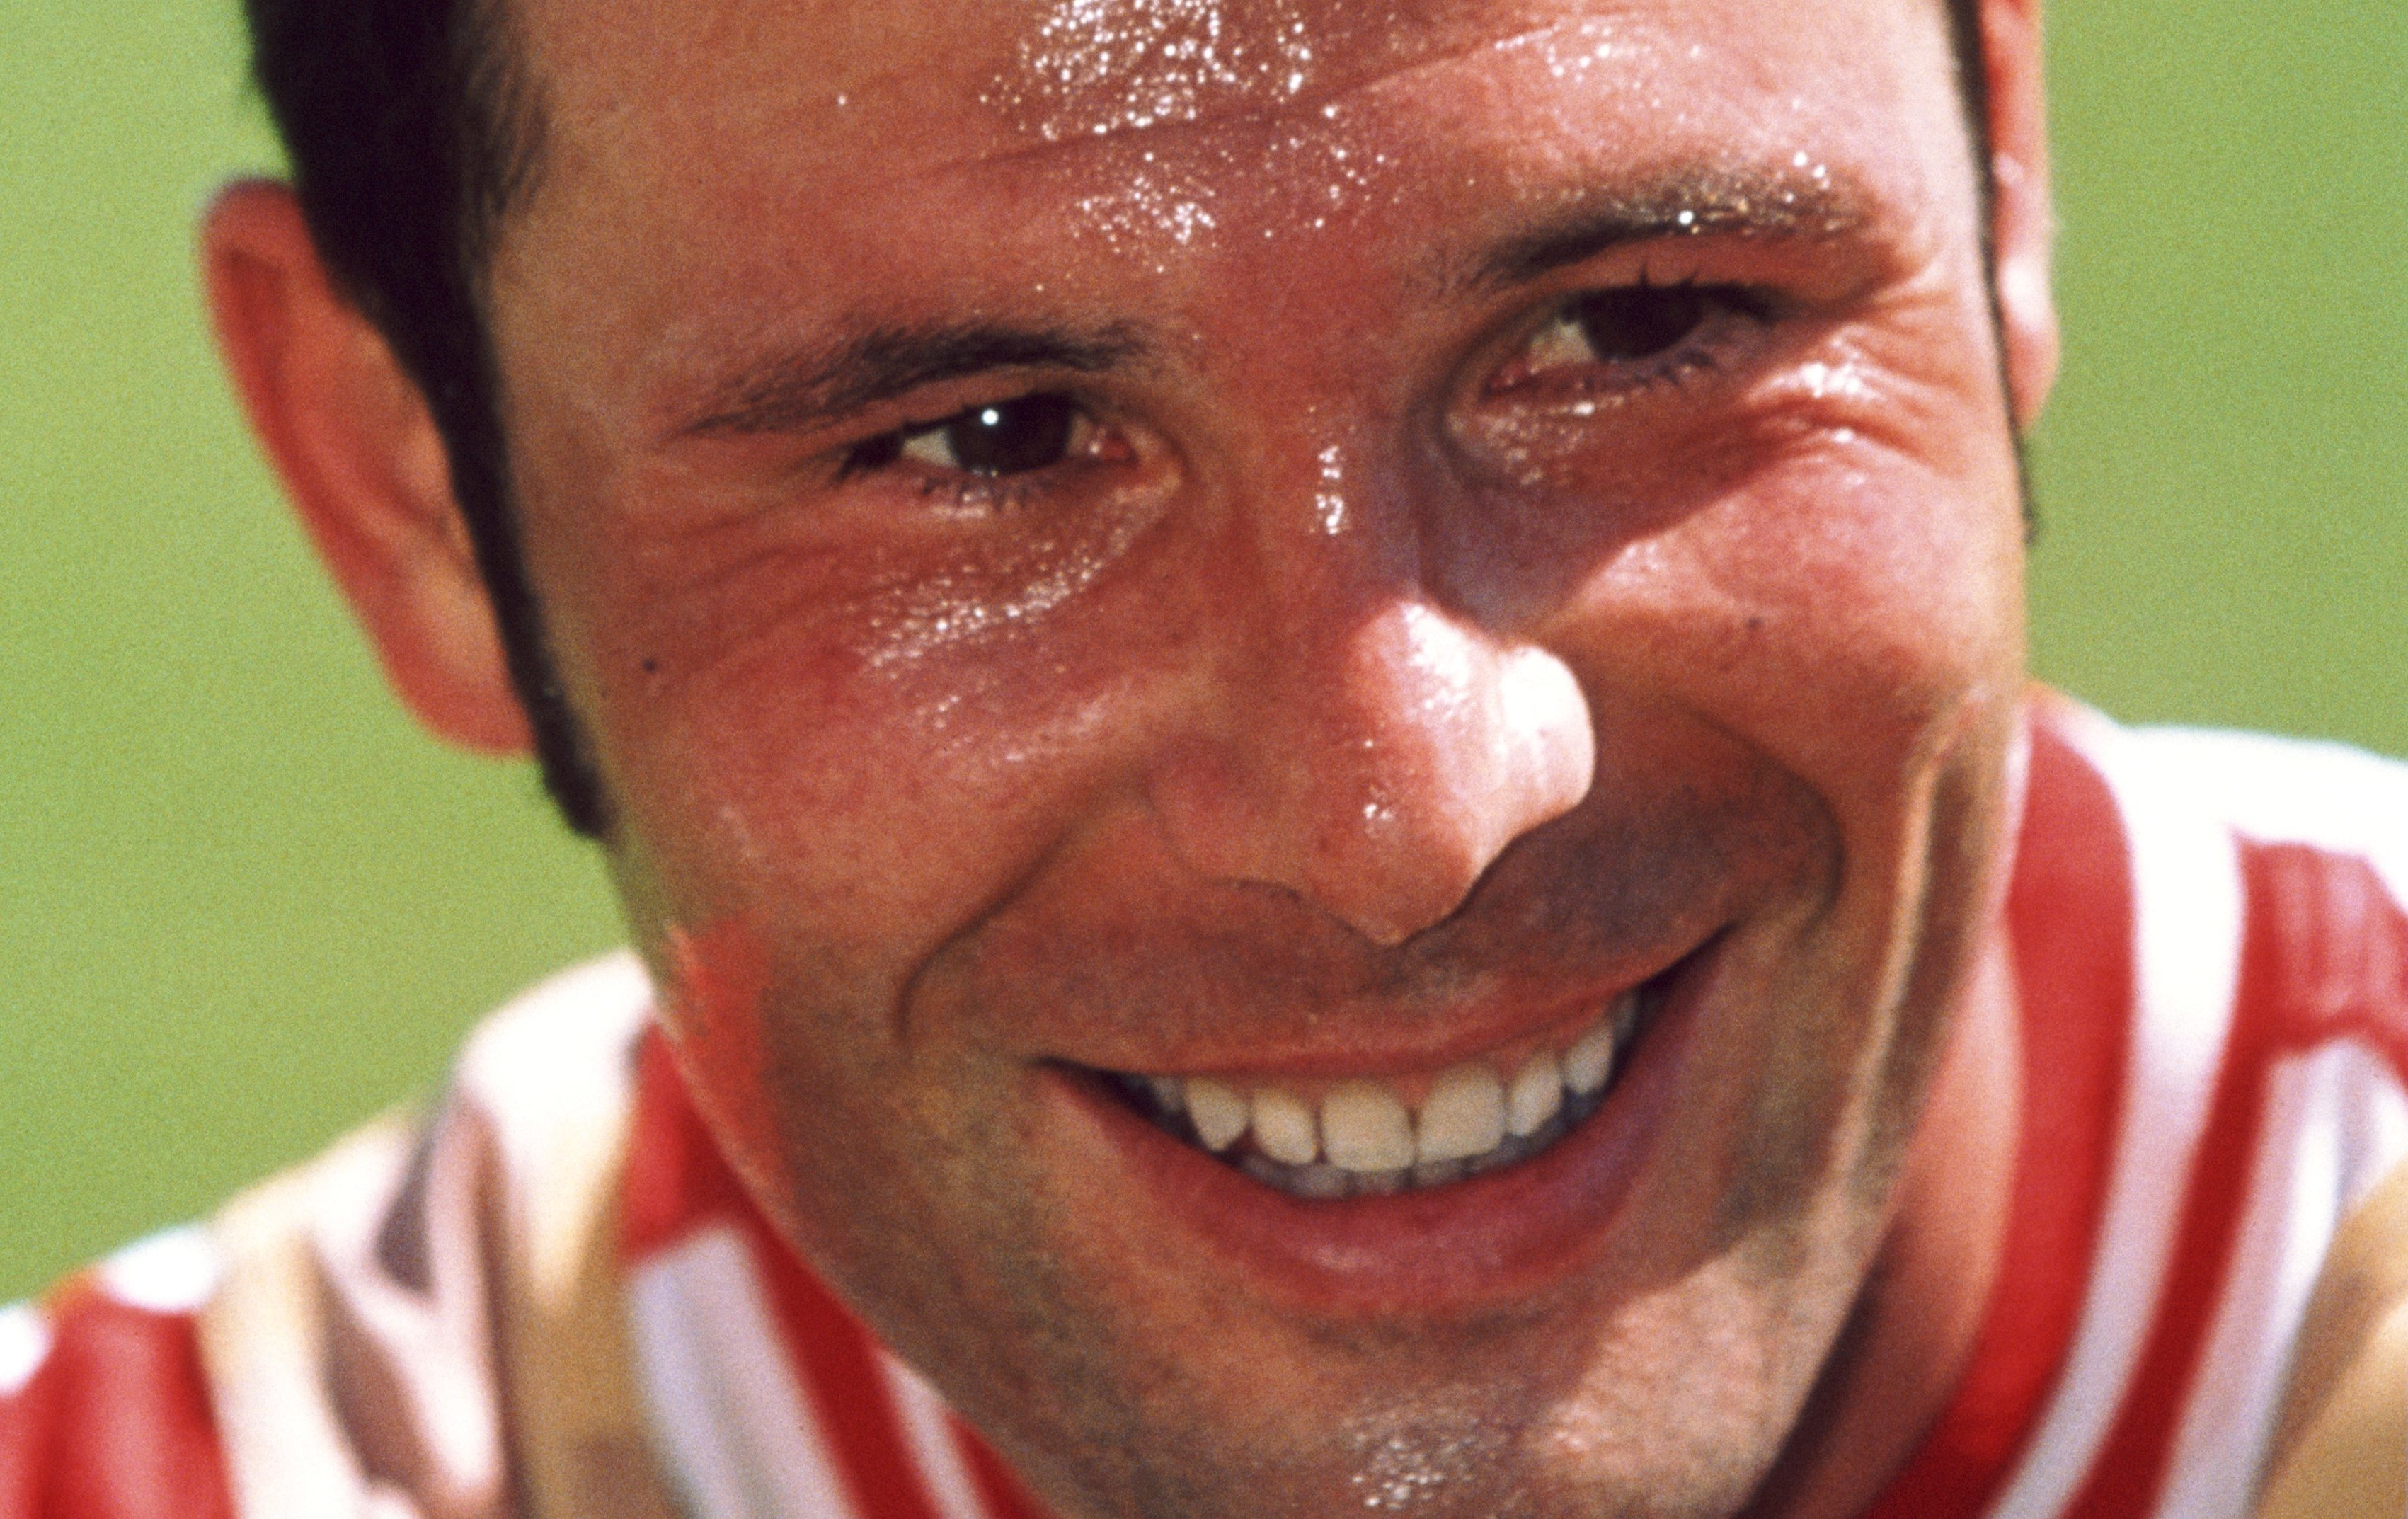 Belgian footballer Jean-Marc Bosman (Getty Images)